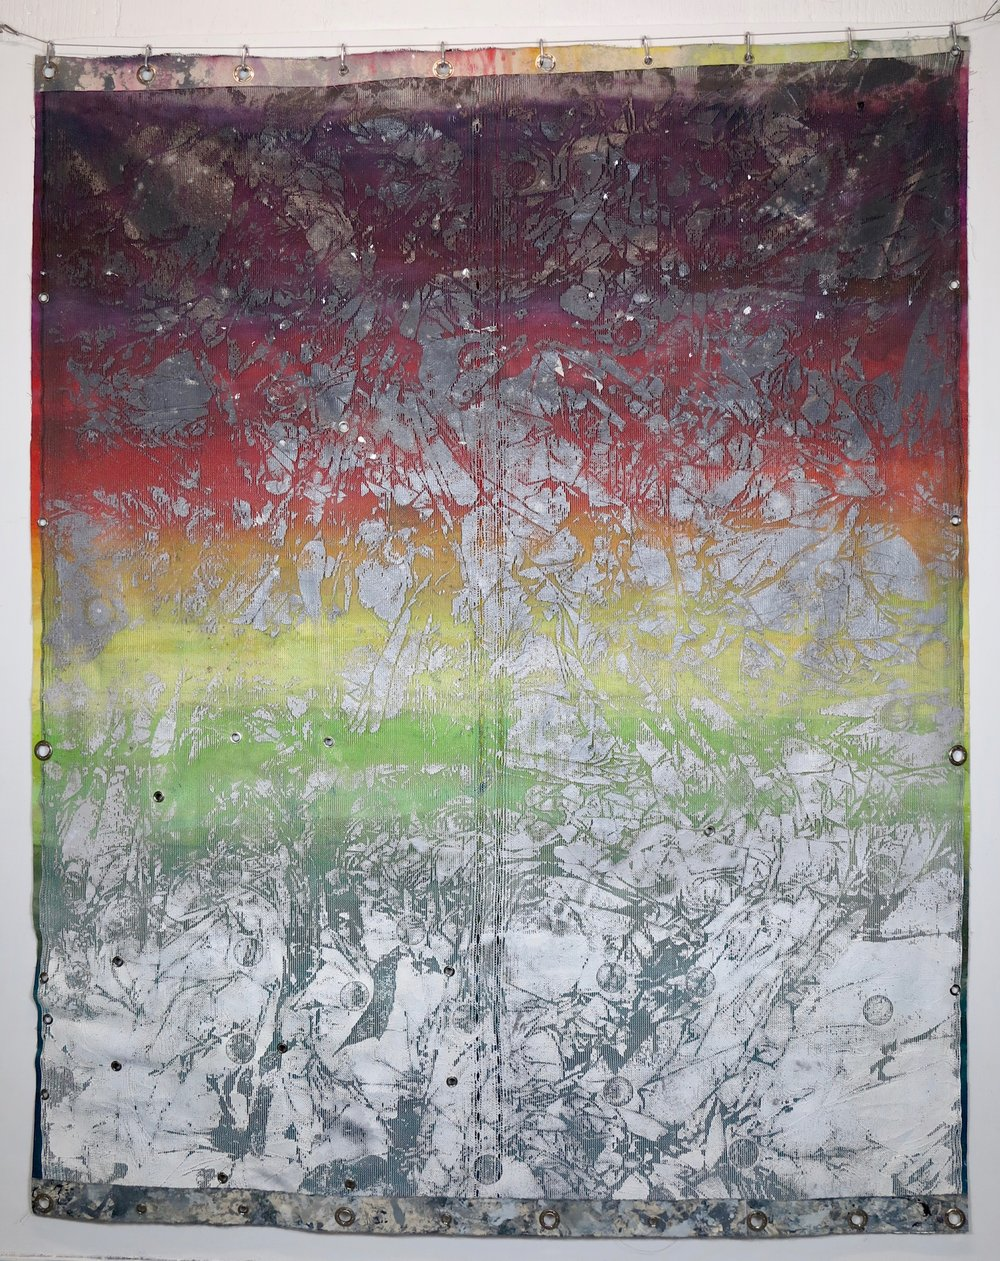 Freak Code (B Side).   Debris netting, spray paint, acrylic, cotton and eyelets.  250 x 200 cm.   Hack Morecambe,  Morecambe 2018.